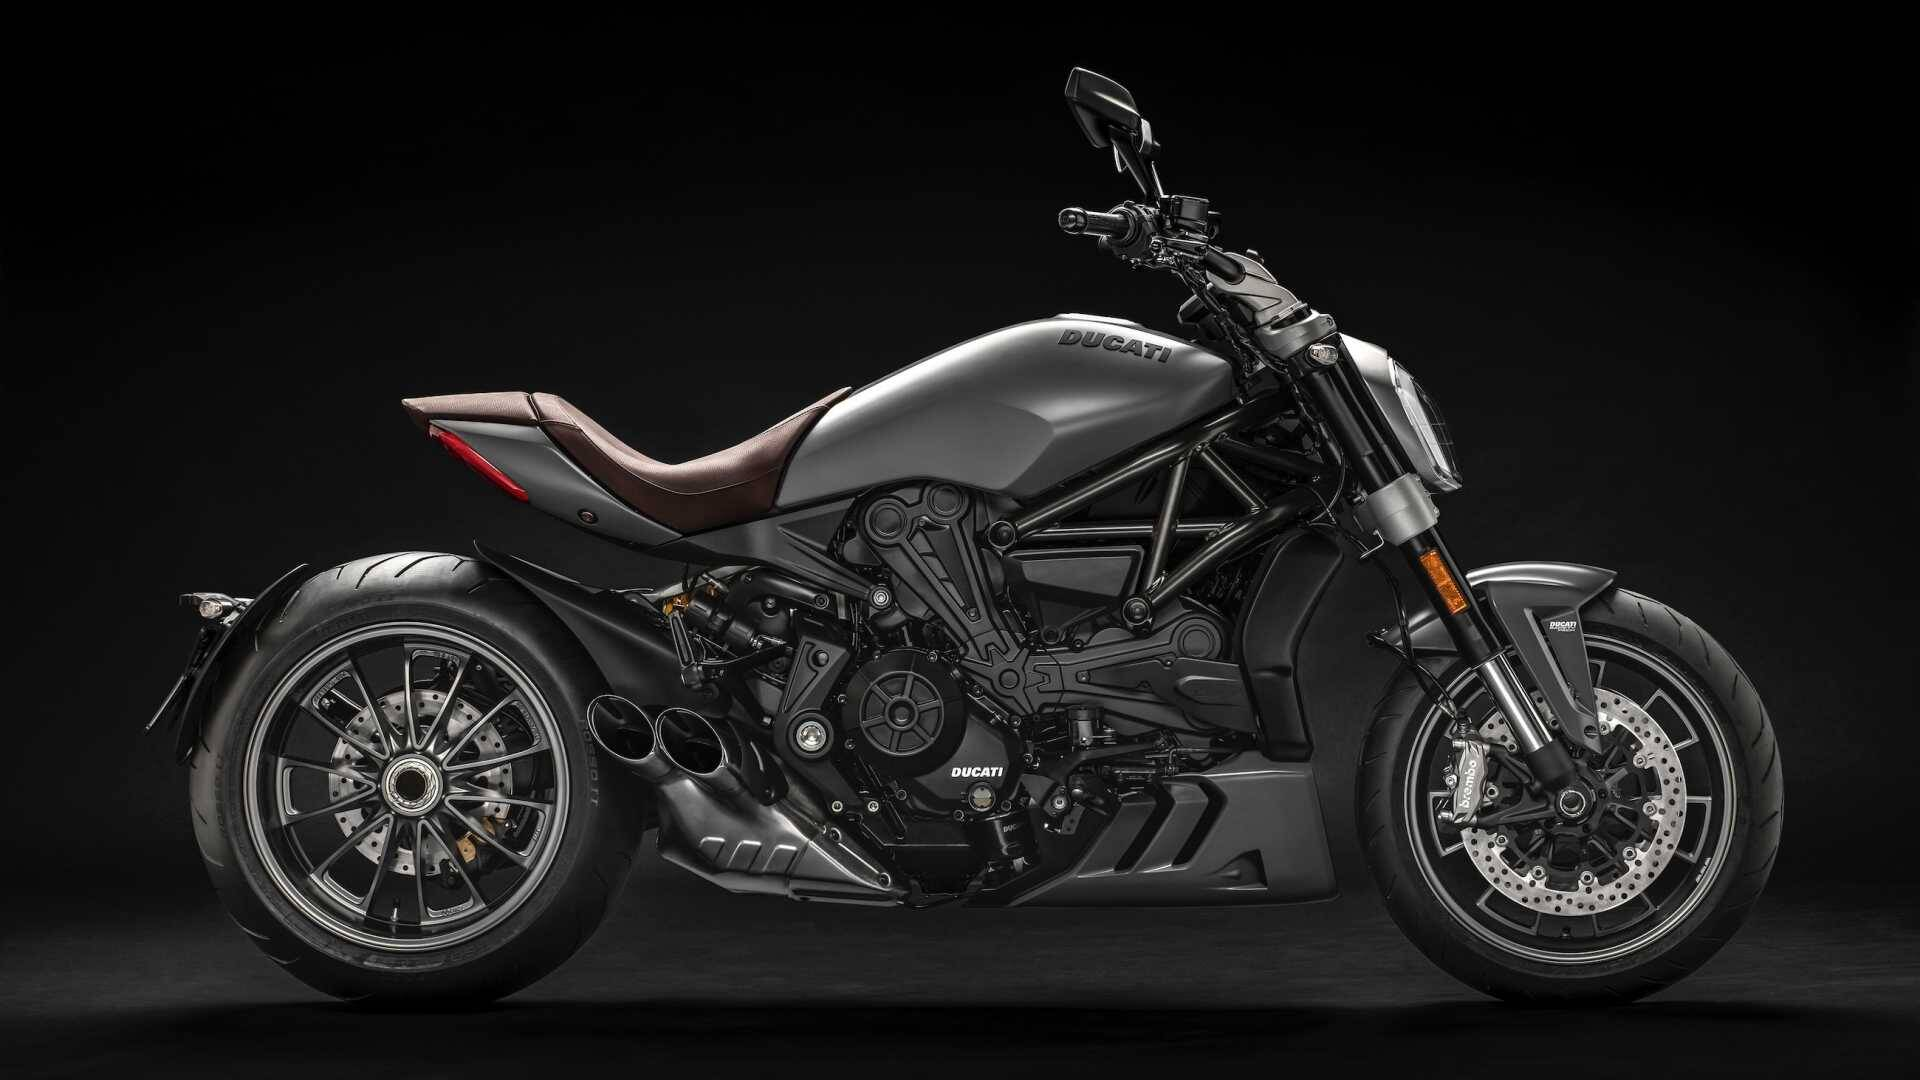 Ducati XDiavel Dark. Foto: Divulgação